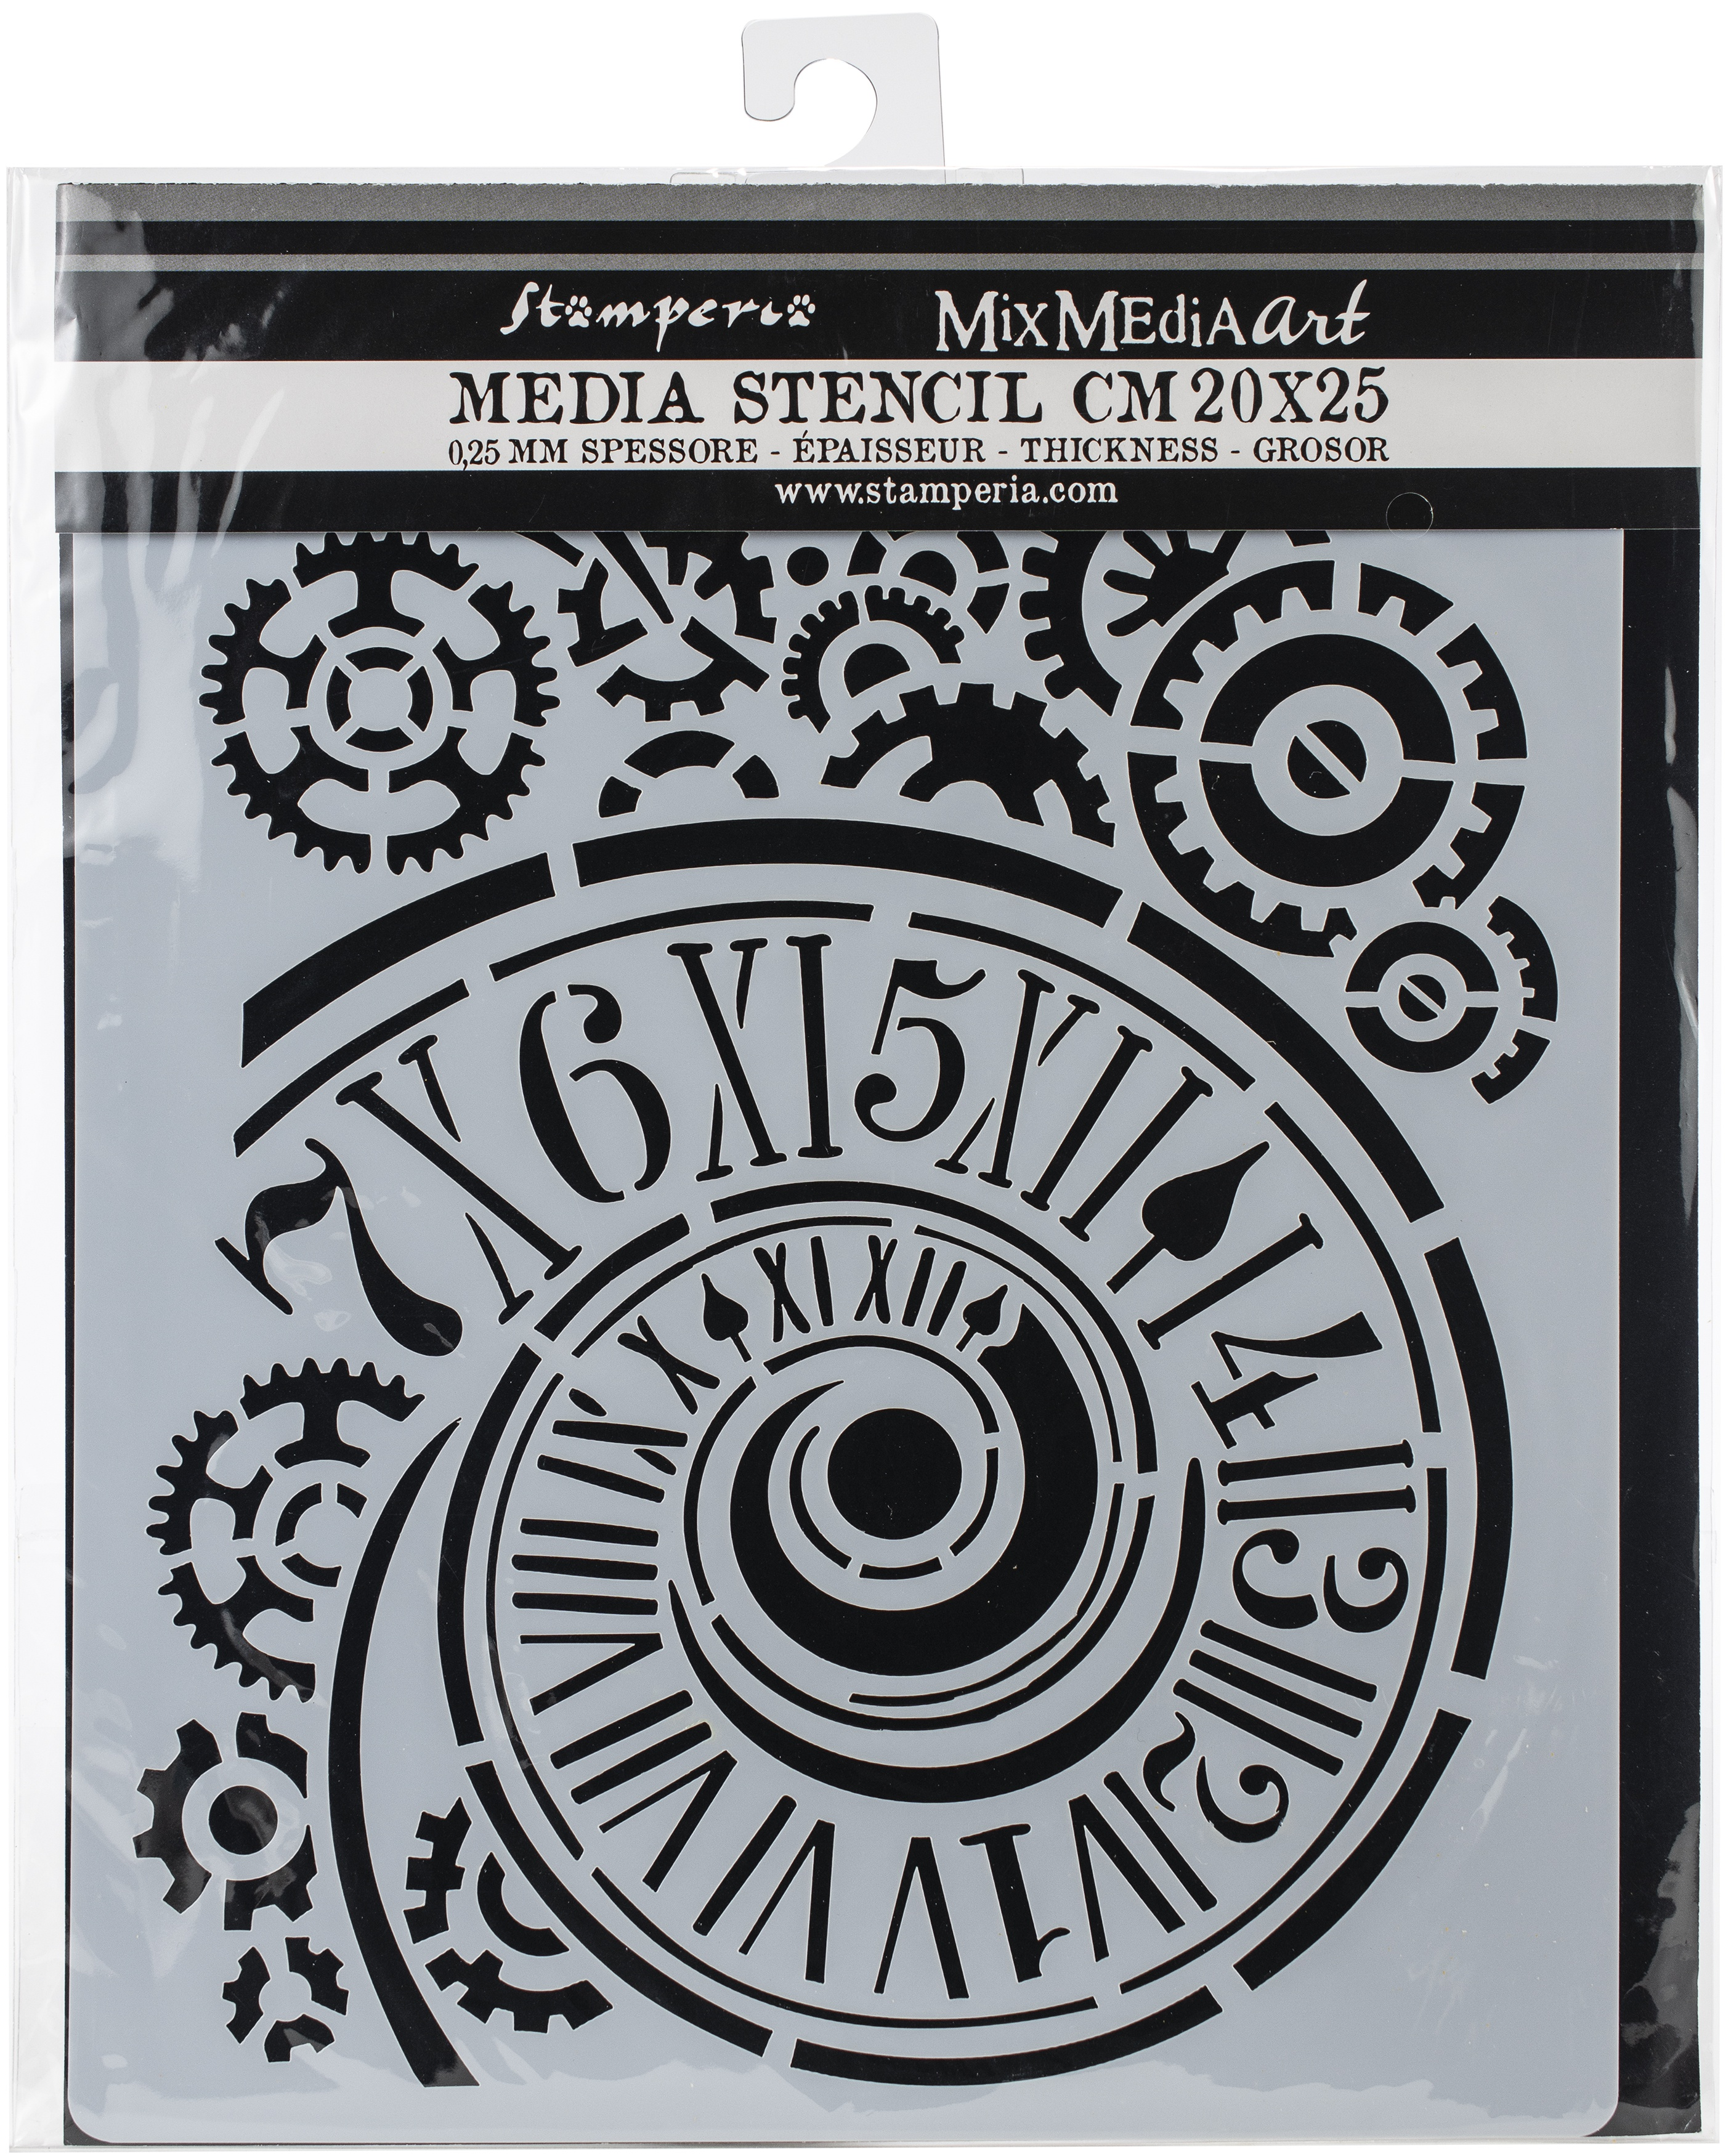 Stencil - Clock/Mechanism